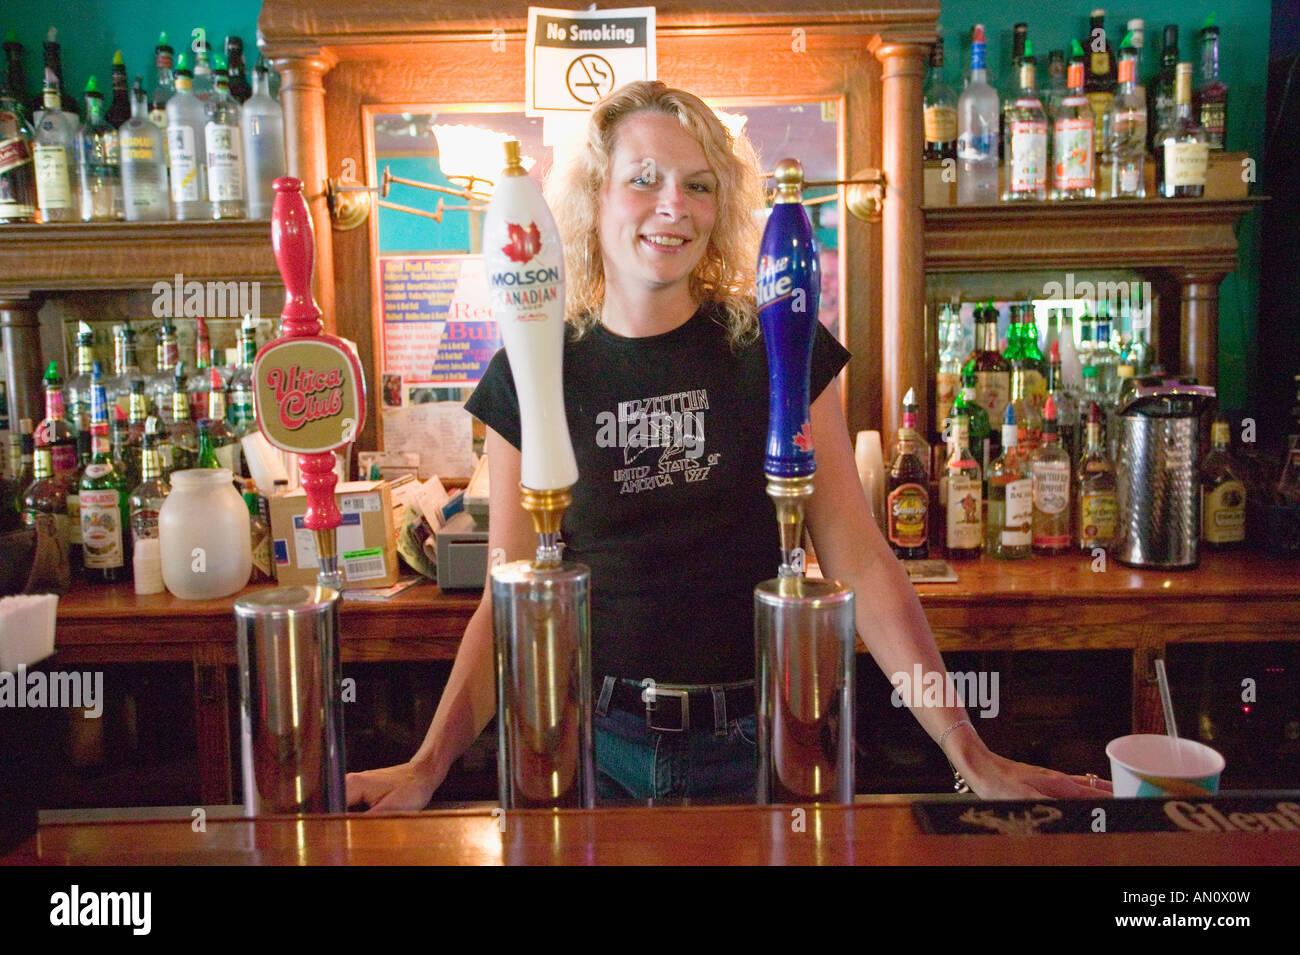 pretty barmaid stock photos & pretty barmaid stock images - alamy